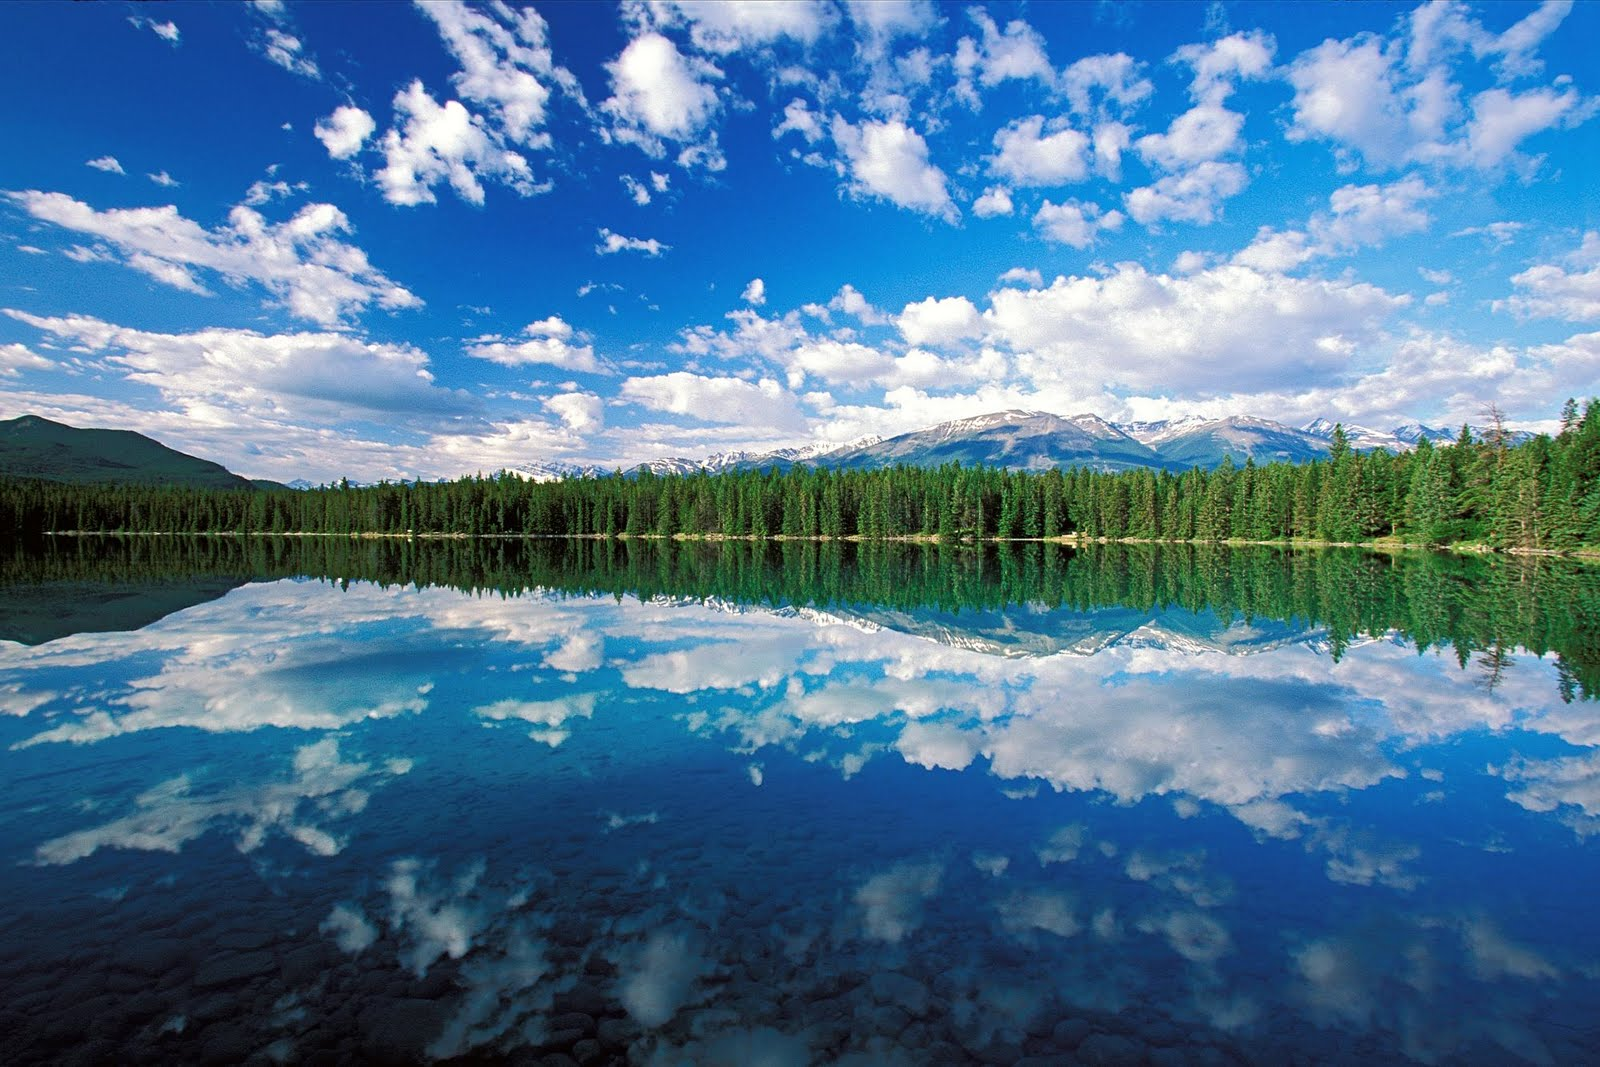 edith lake jasper national park canada Wallpapers HD - edith lake jasper national park canada wallpapers